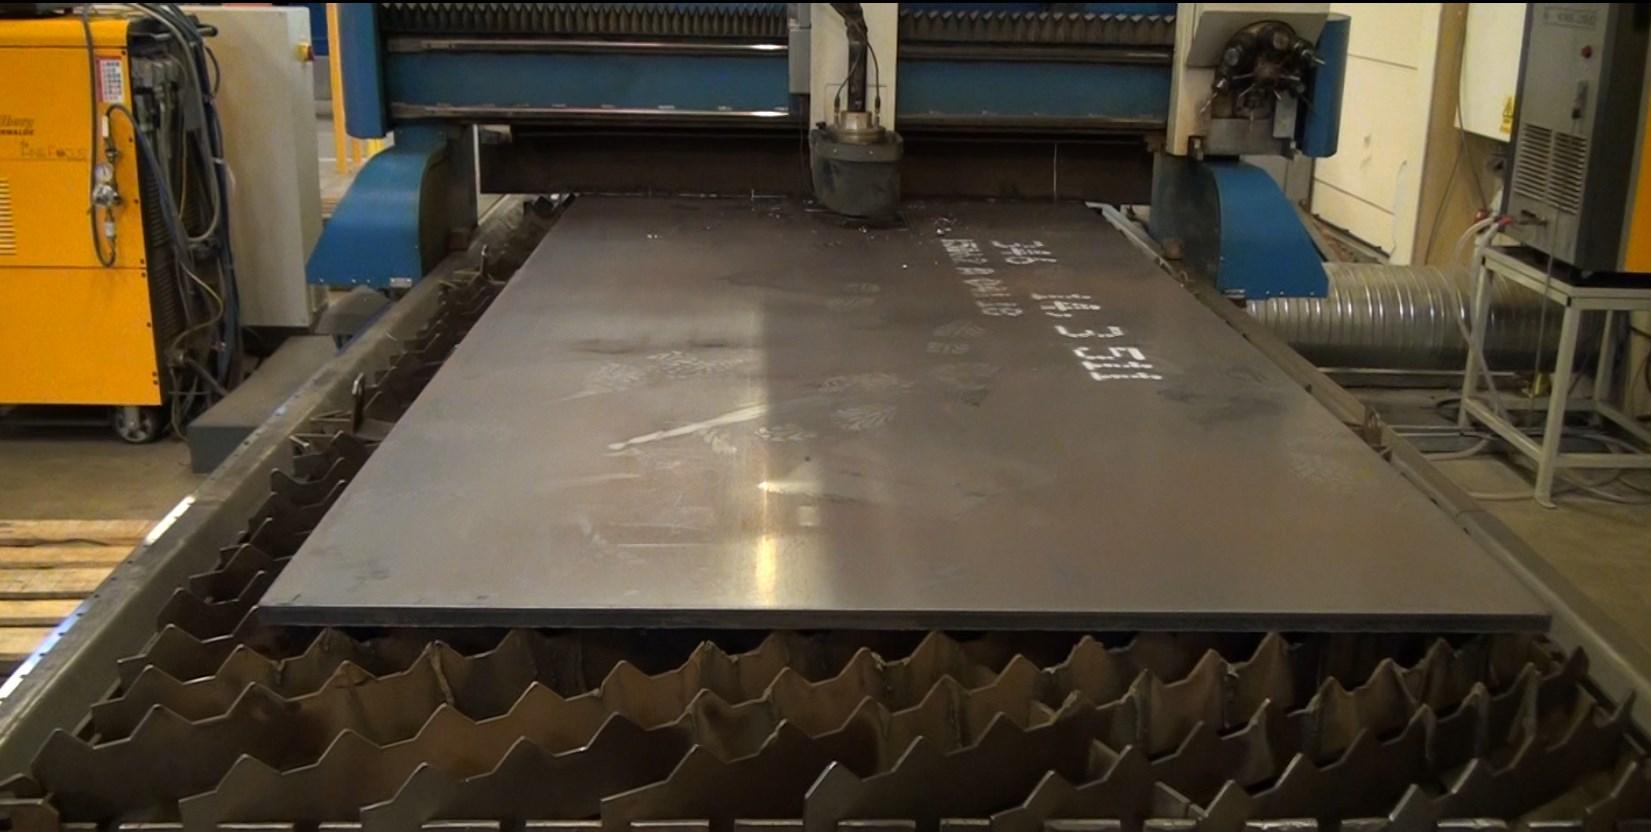 Image - Plasma cutting of plates